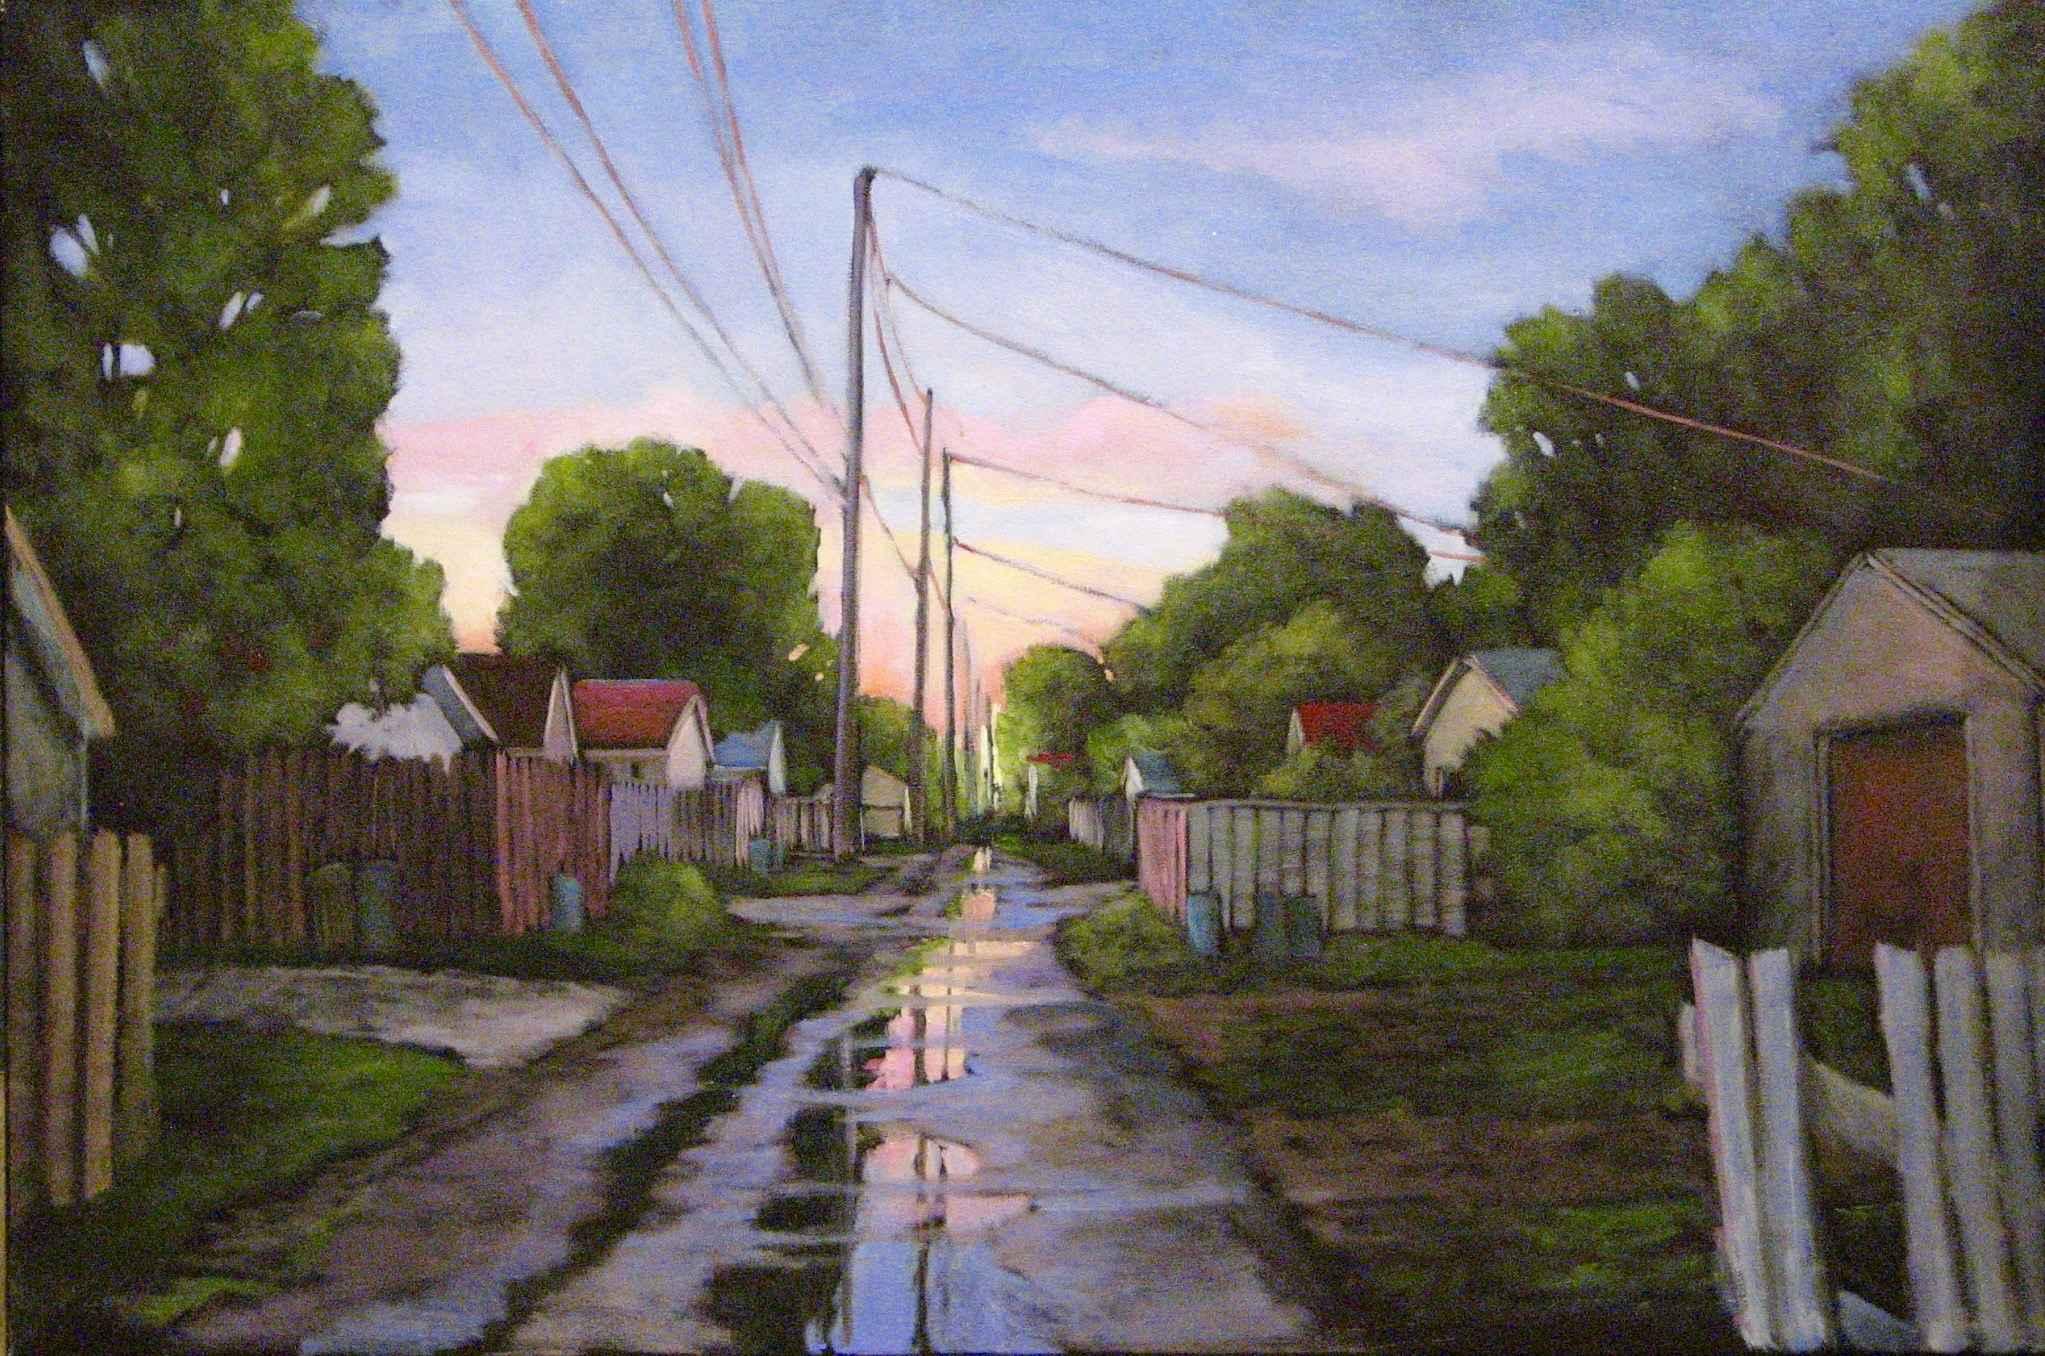 My Alley in Sunset by  Kari Duke - Masterpiece Online